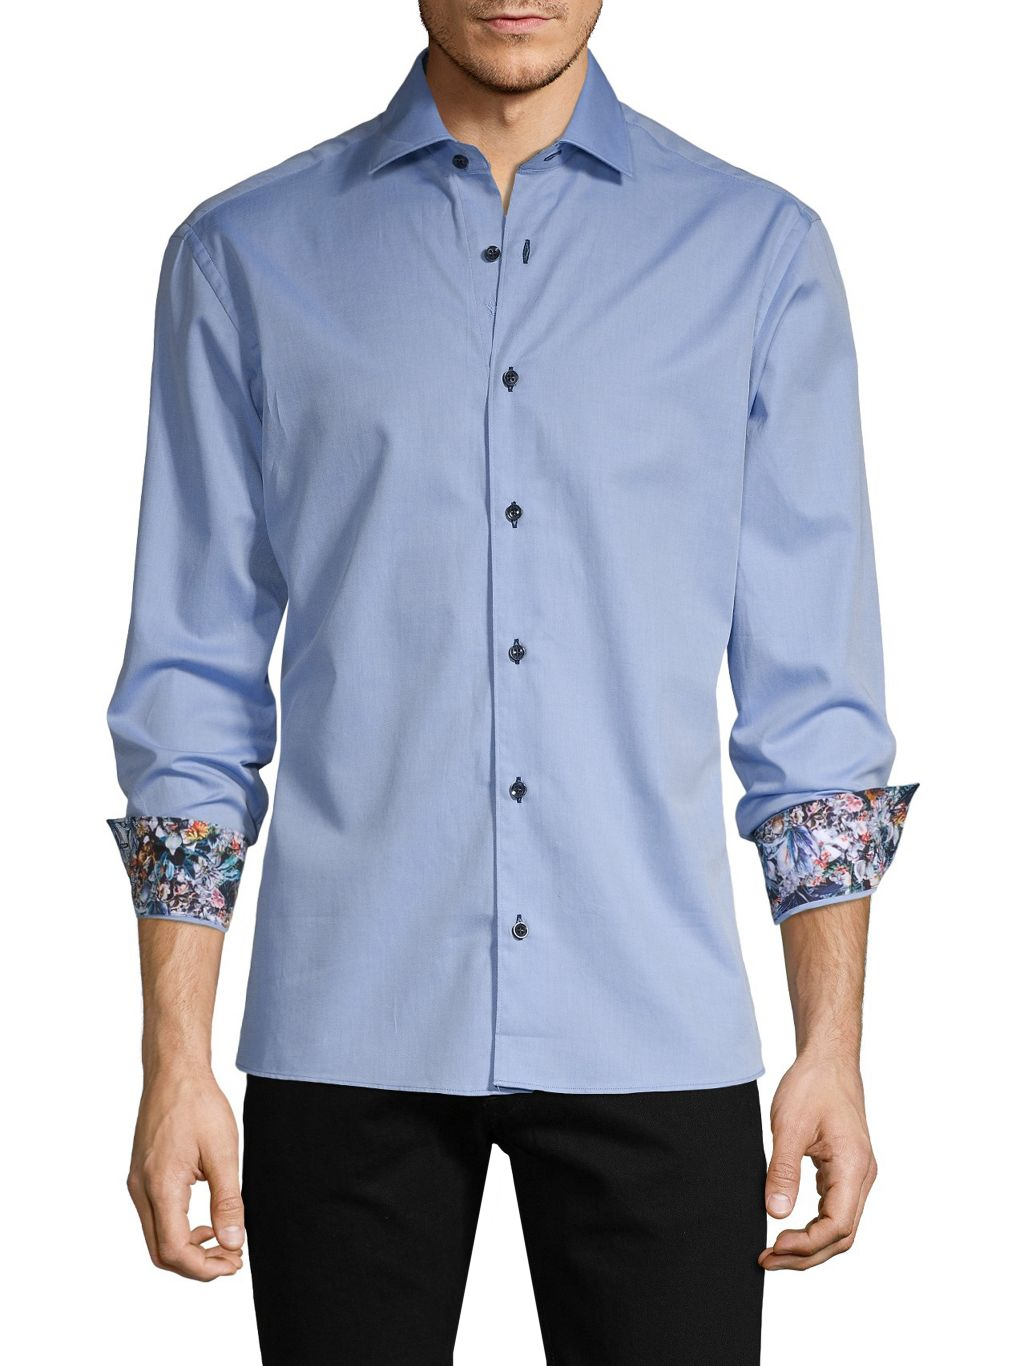 Bertigo High-Low Long-Sleeve Shirt